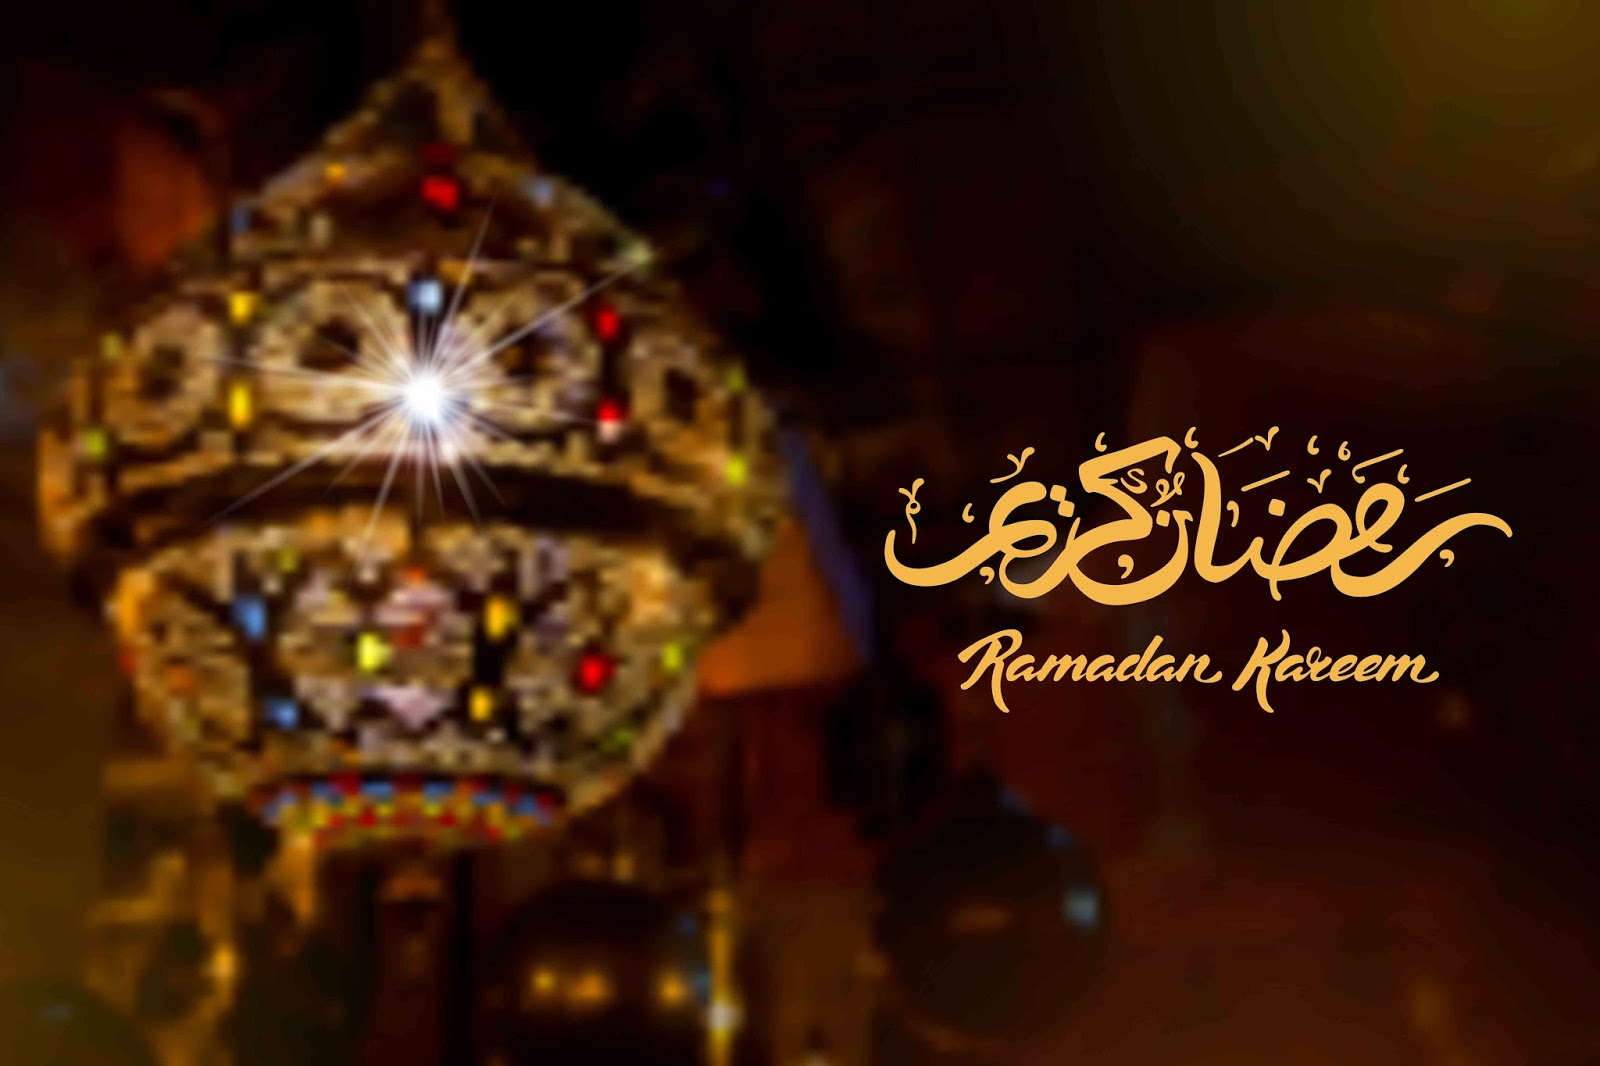 2016 ramadan 2016 calendar welcome ramadan 2016 1437h greeting cards